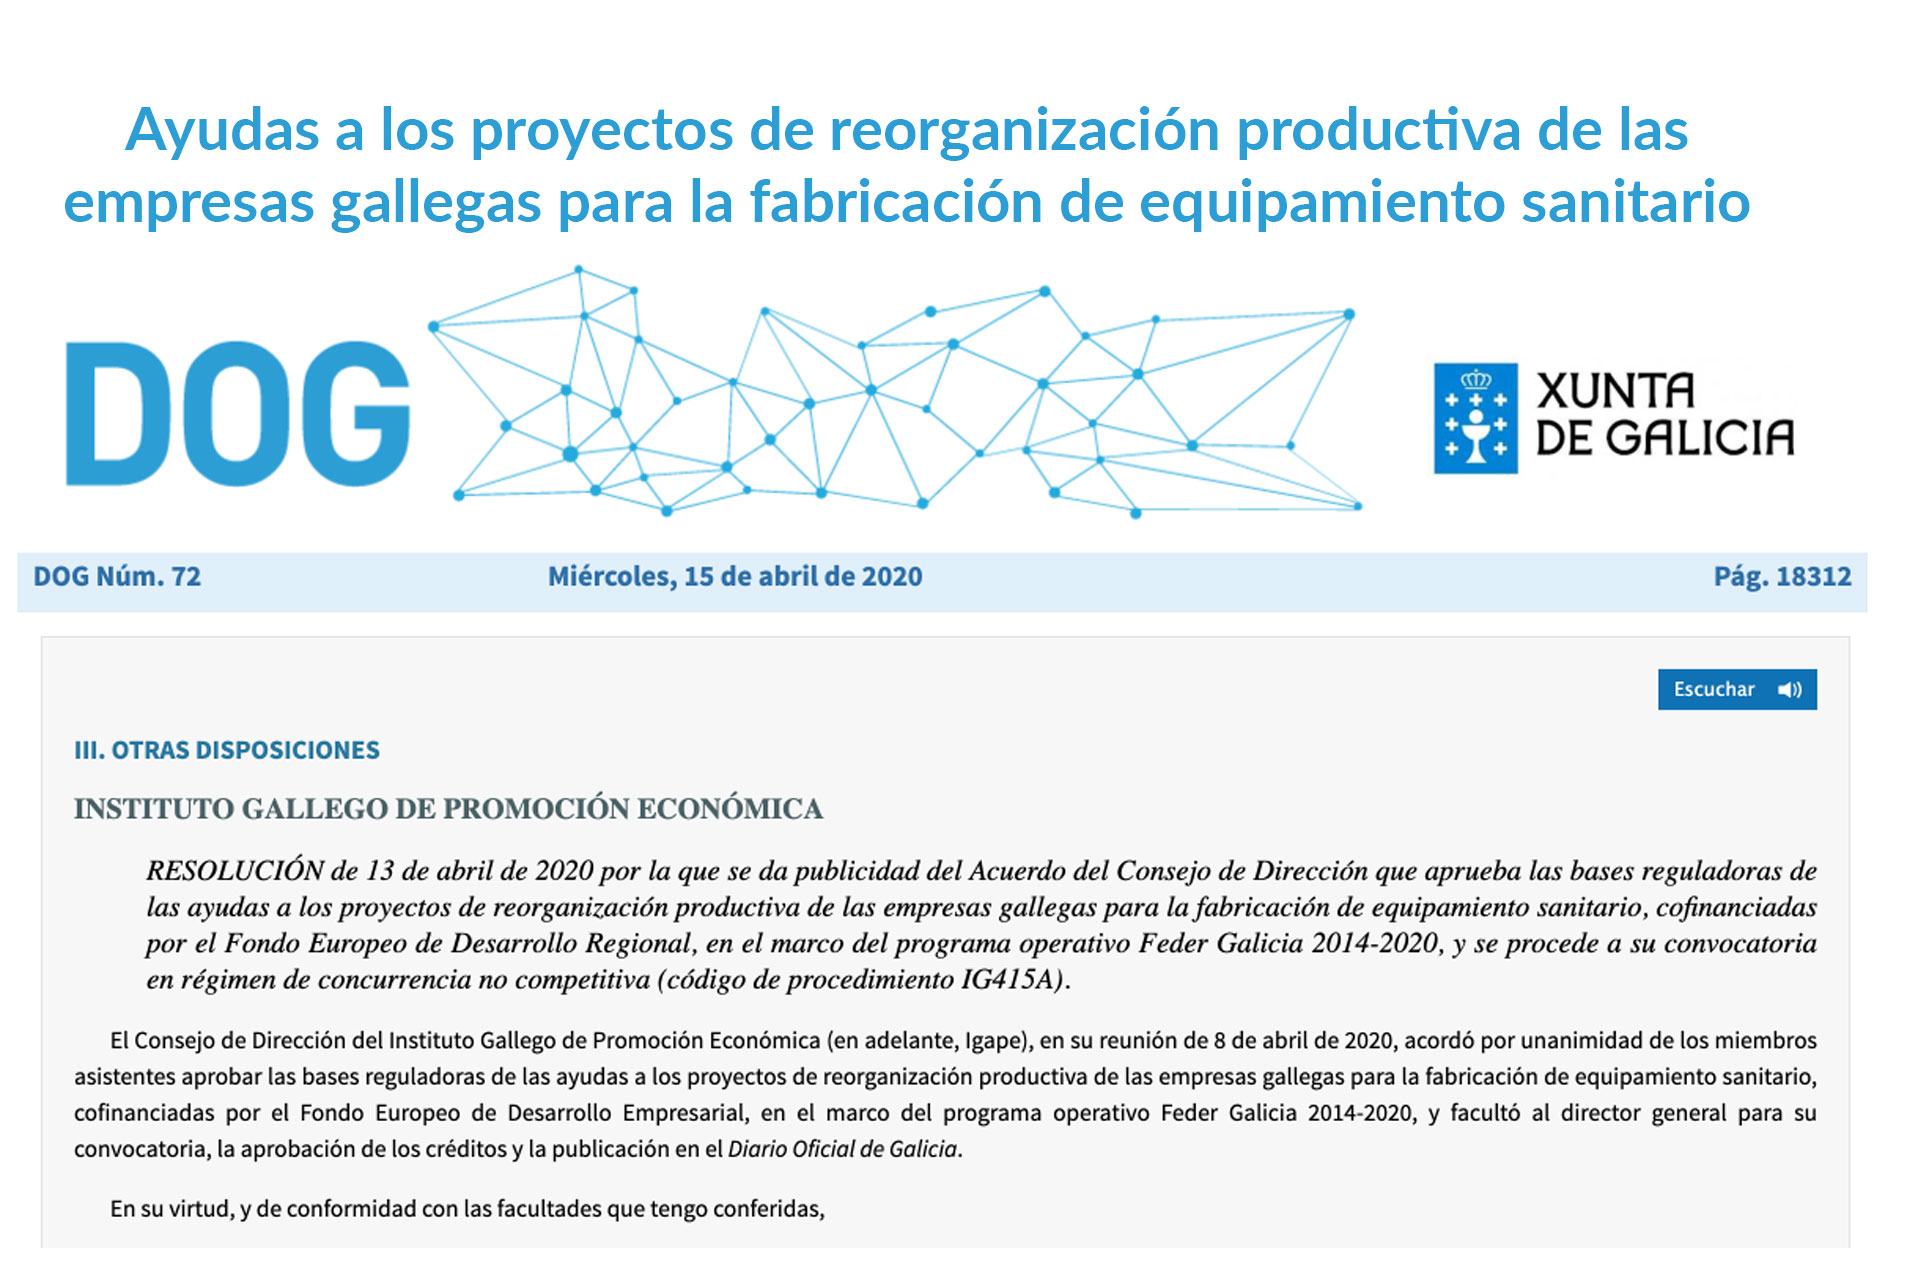 ayudas-pymes-gallegas-reorganizacion-textil-sanitaria